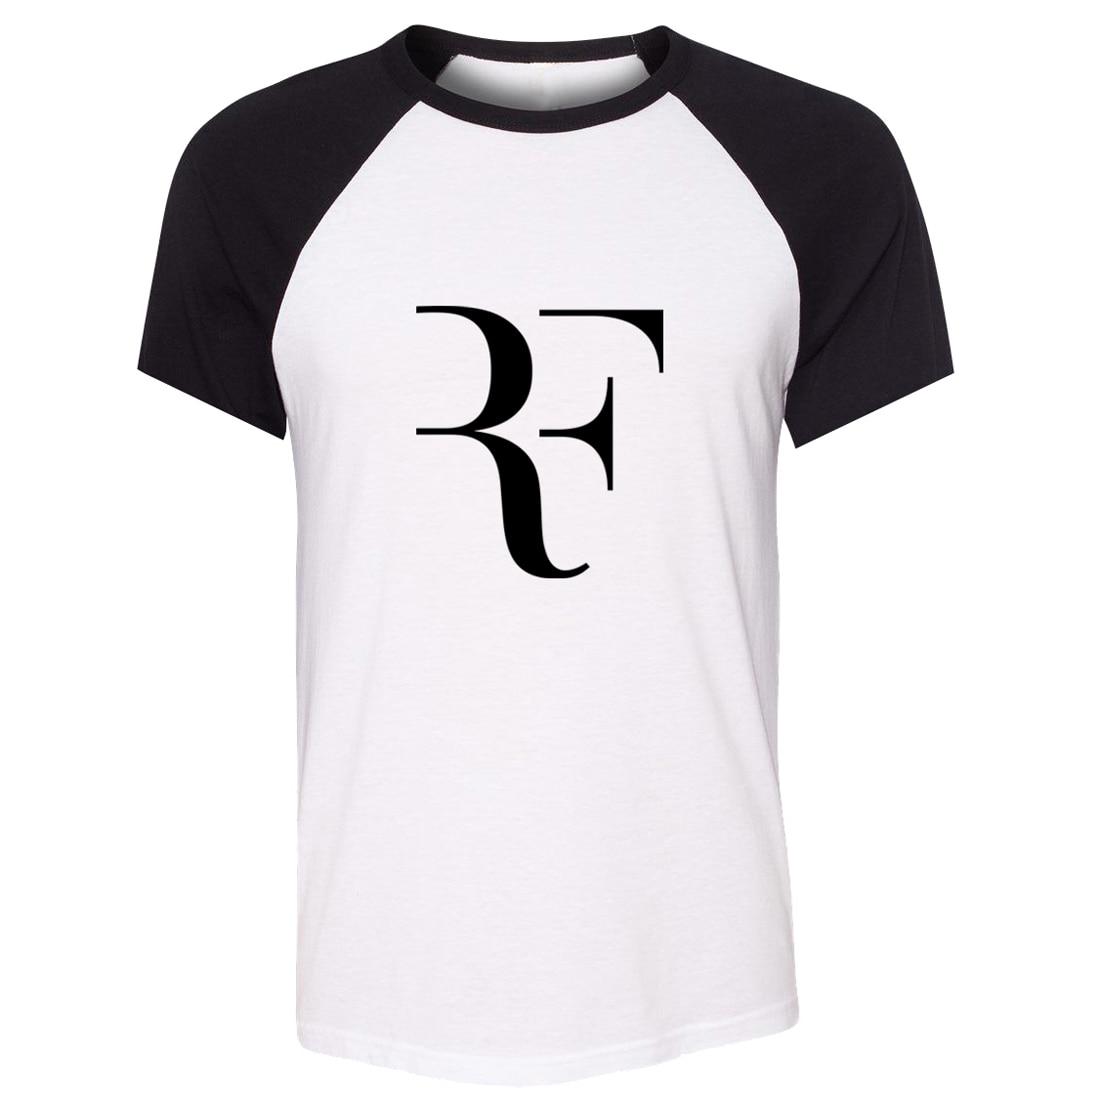 Shirt design price - Idzn Unisex Summer Fashion T Shirt Roger Federer Tennis Fans Art Pattern Design Raglan Short